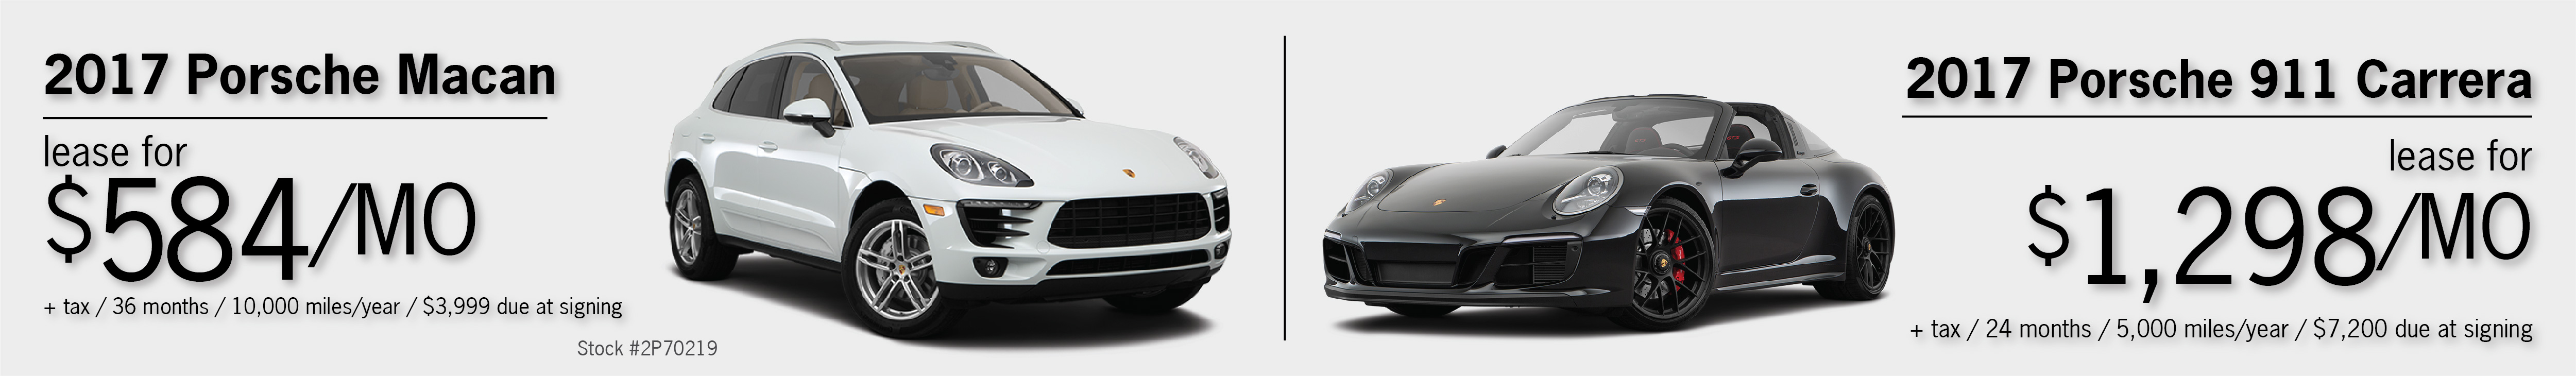 2017 Macan & 2017 911 Carrera